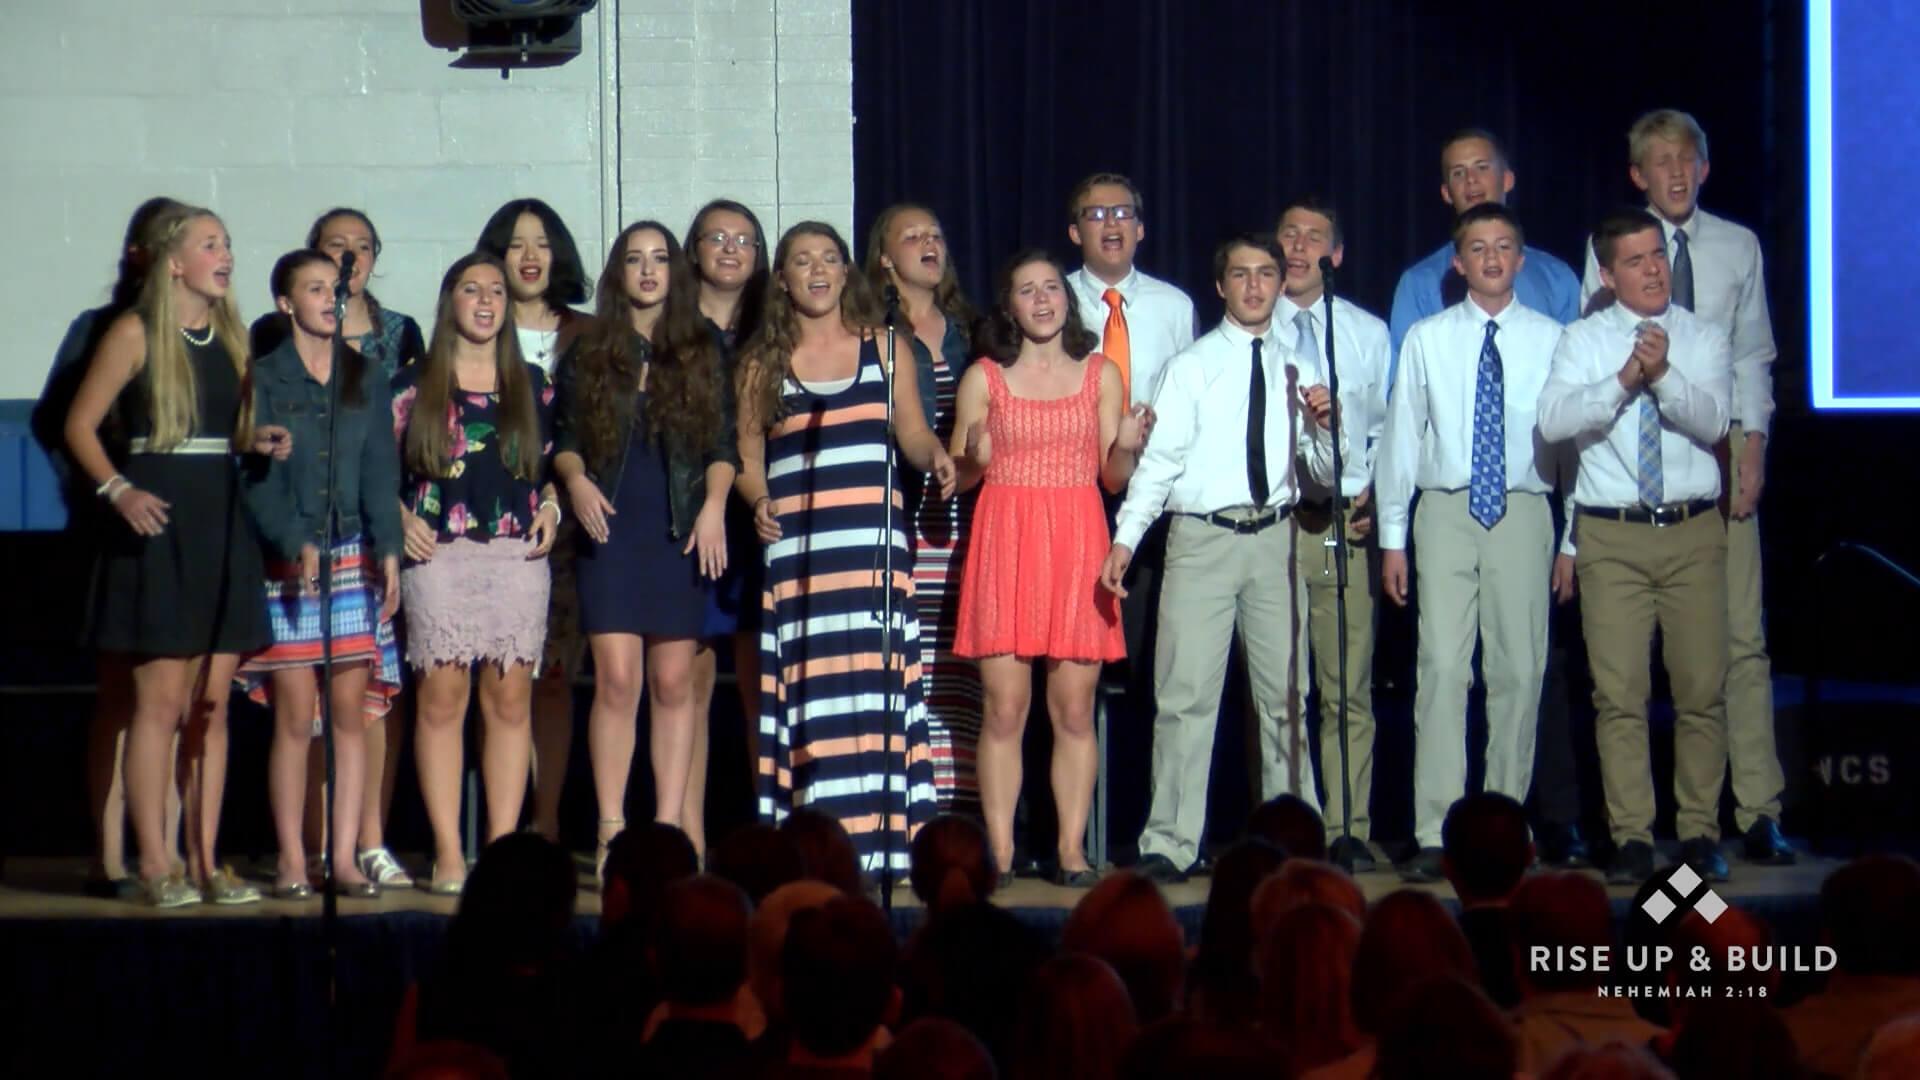 Whitinsville Christian School